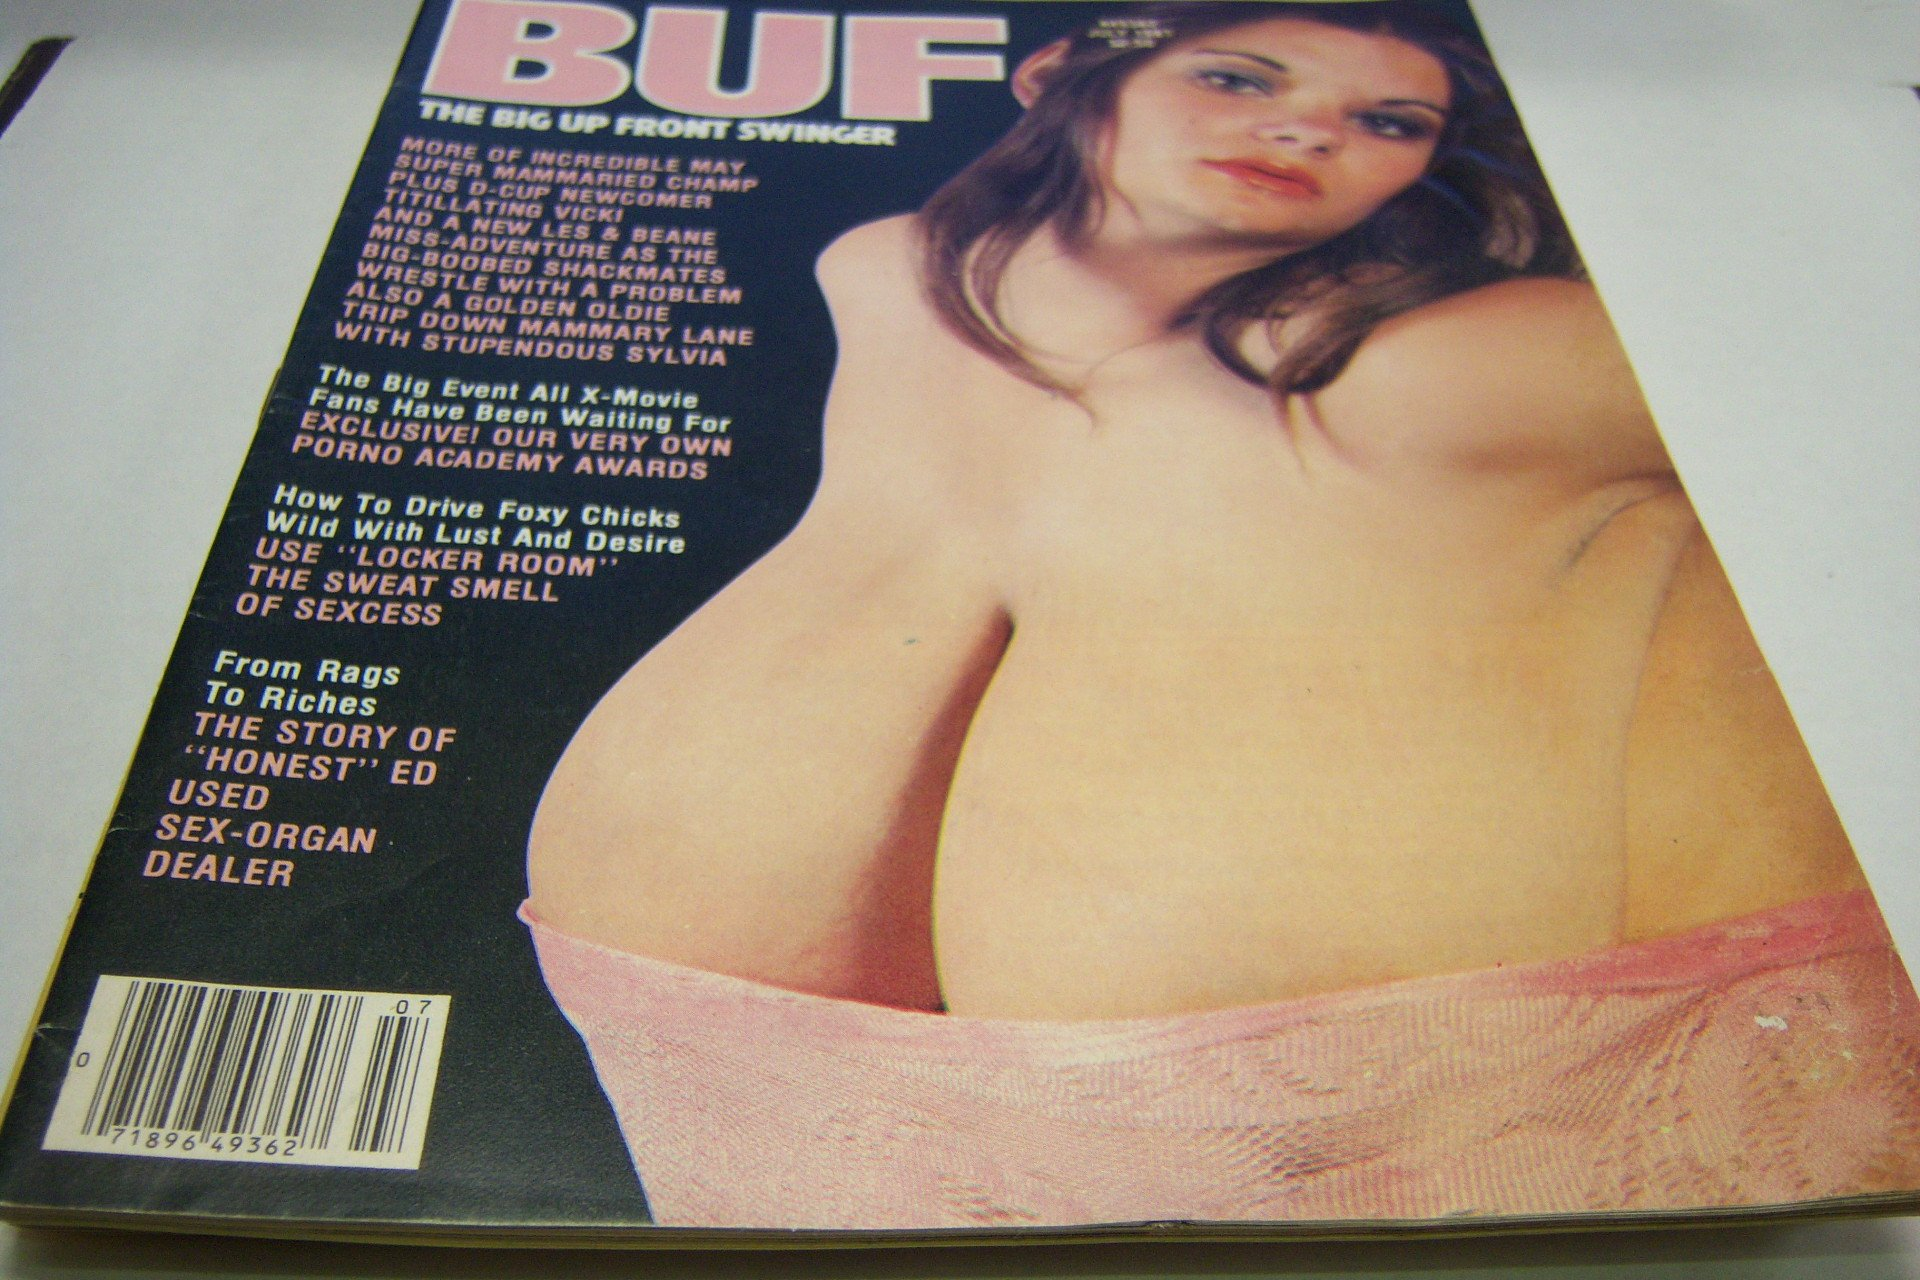 Breast feeding pics porn